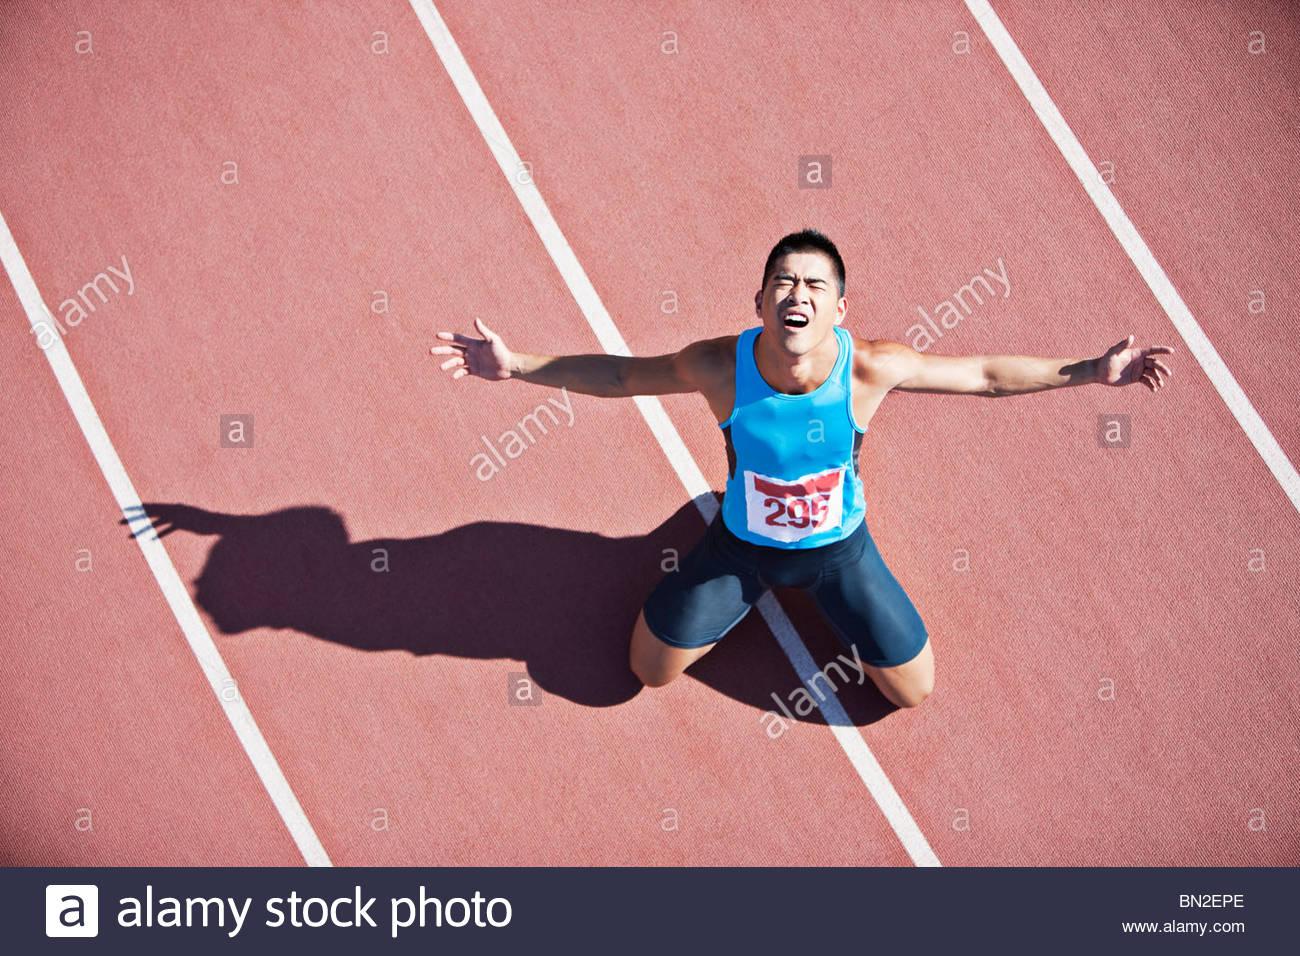 Enttäuscht Läufer kniend auf dem richtigen Weg Stockbild